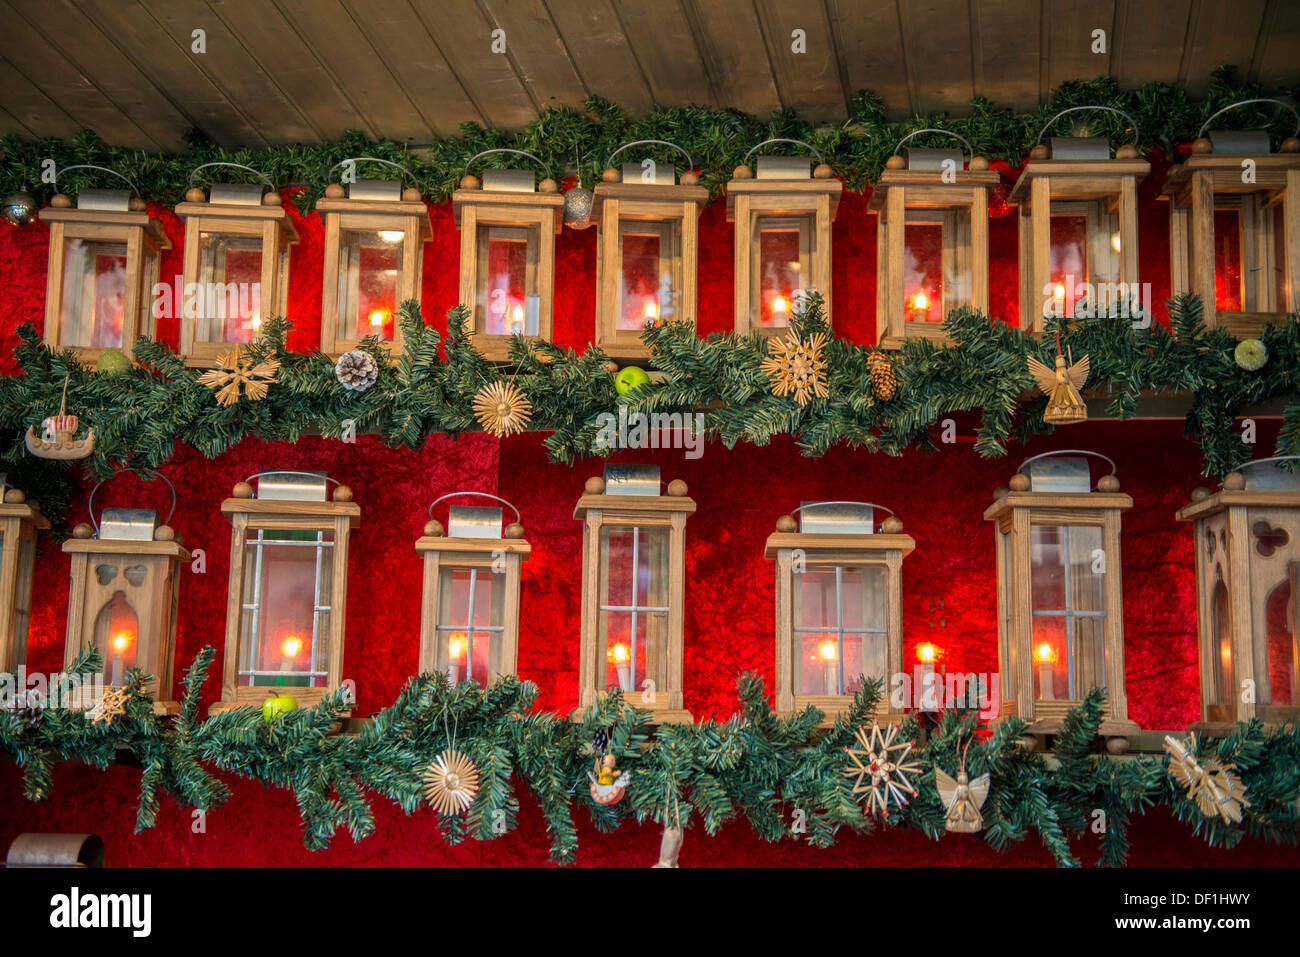 Lanterns for sale at Christmas market, Rothenburg, Germany Stock ...